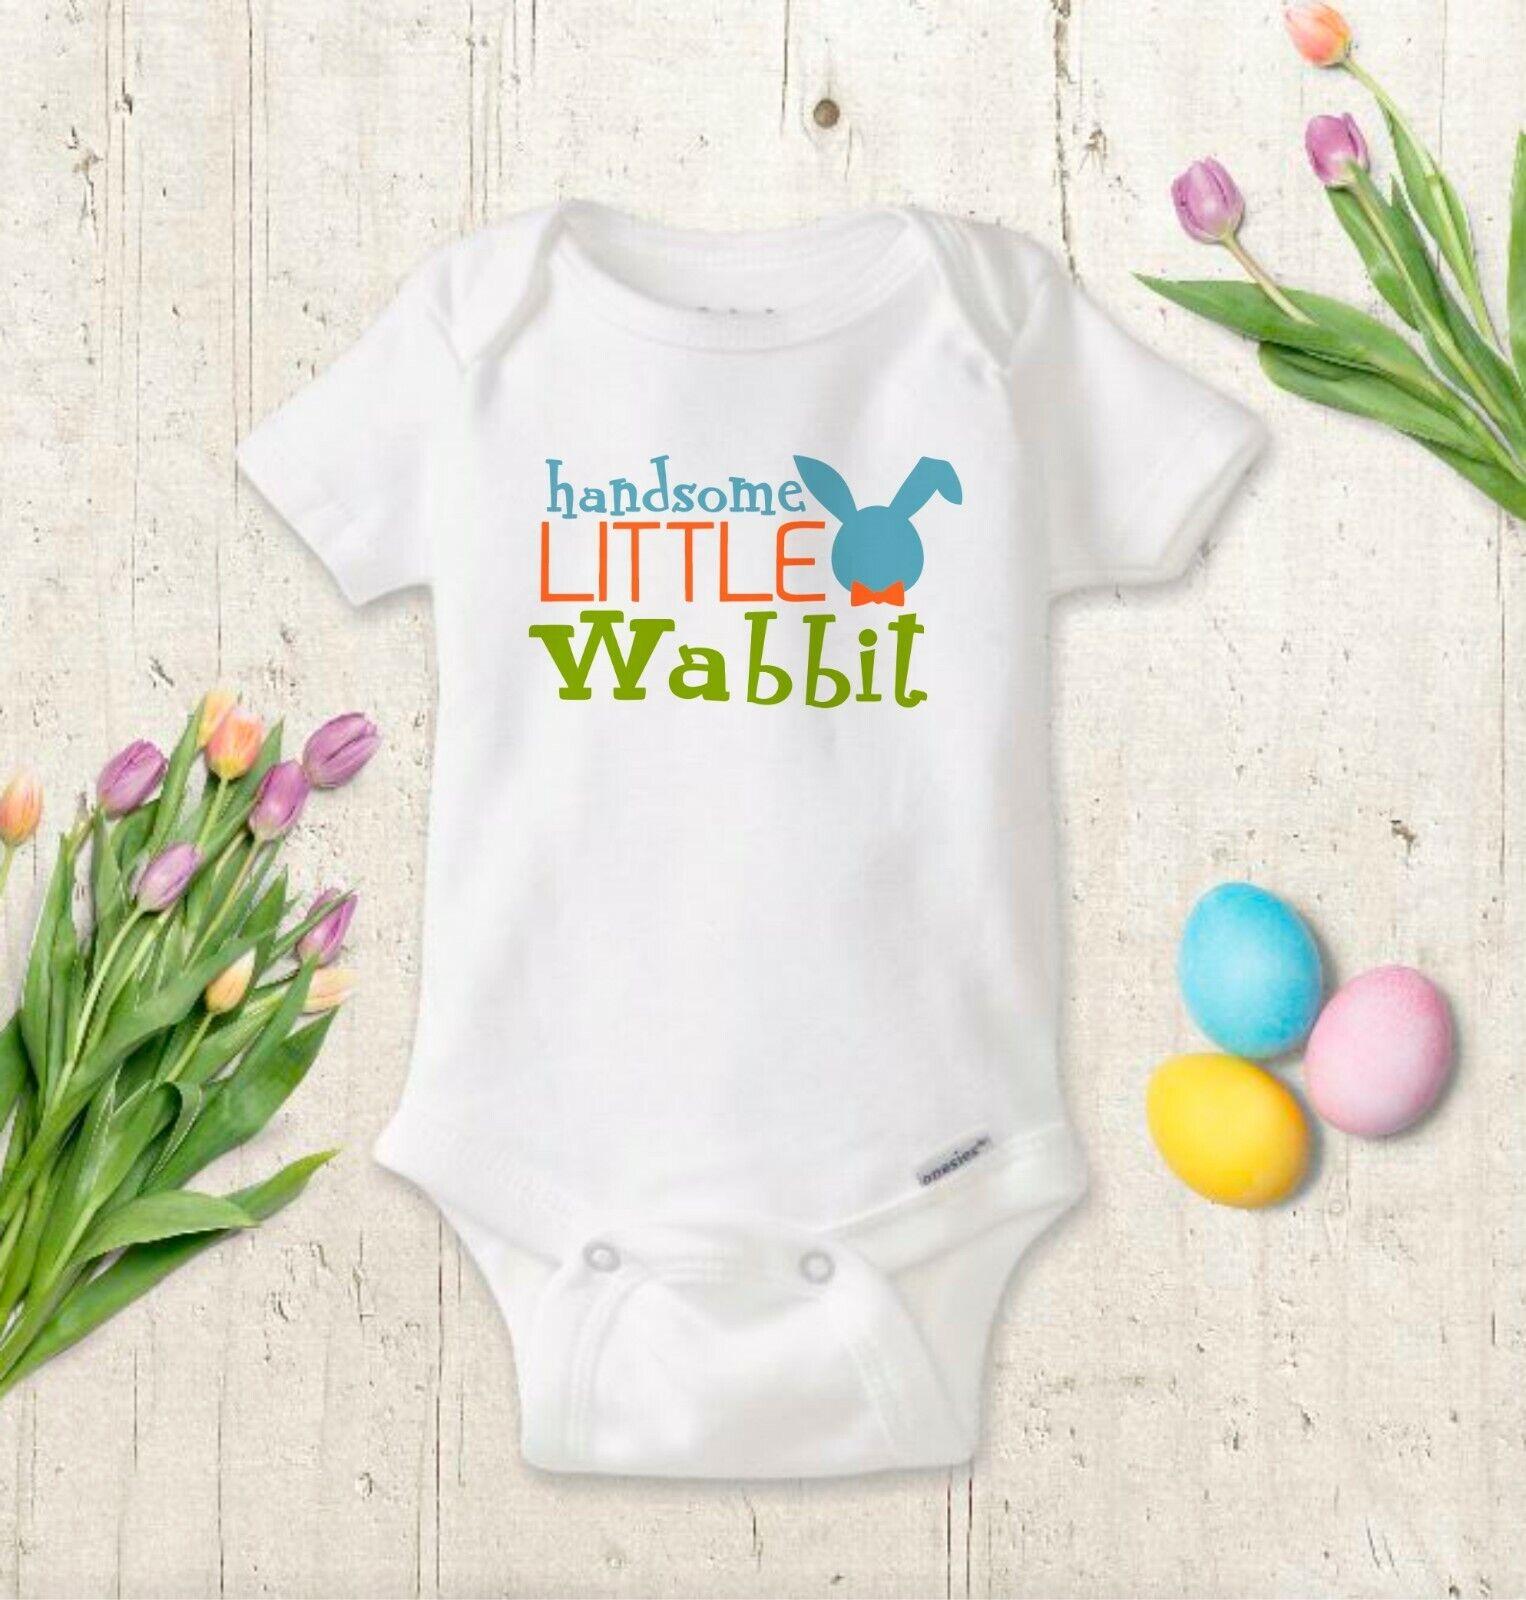 Baby Boy Bodysuit, Toddler Boy Shirt, Easter Bodysuit, Hands